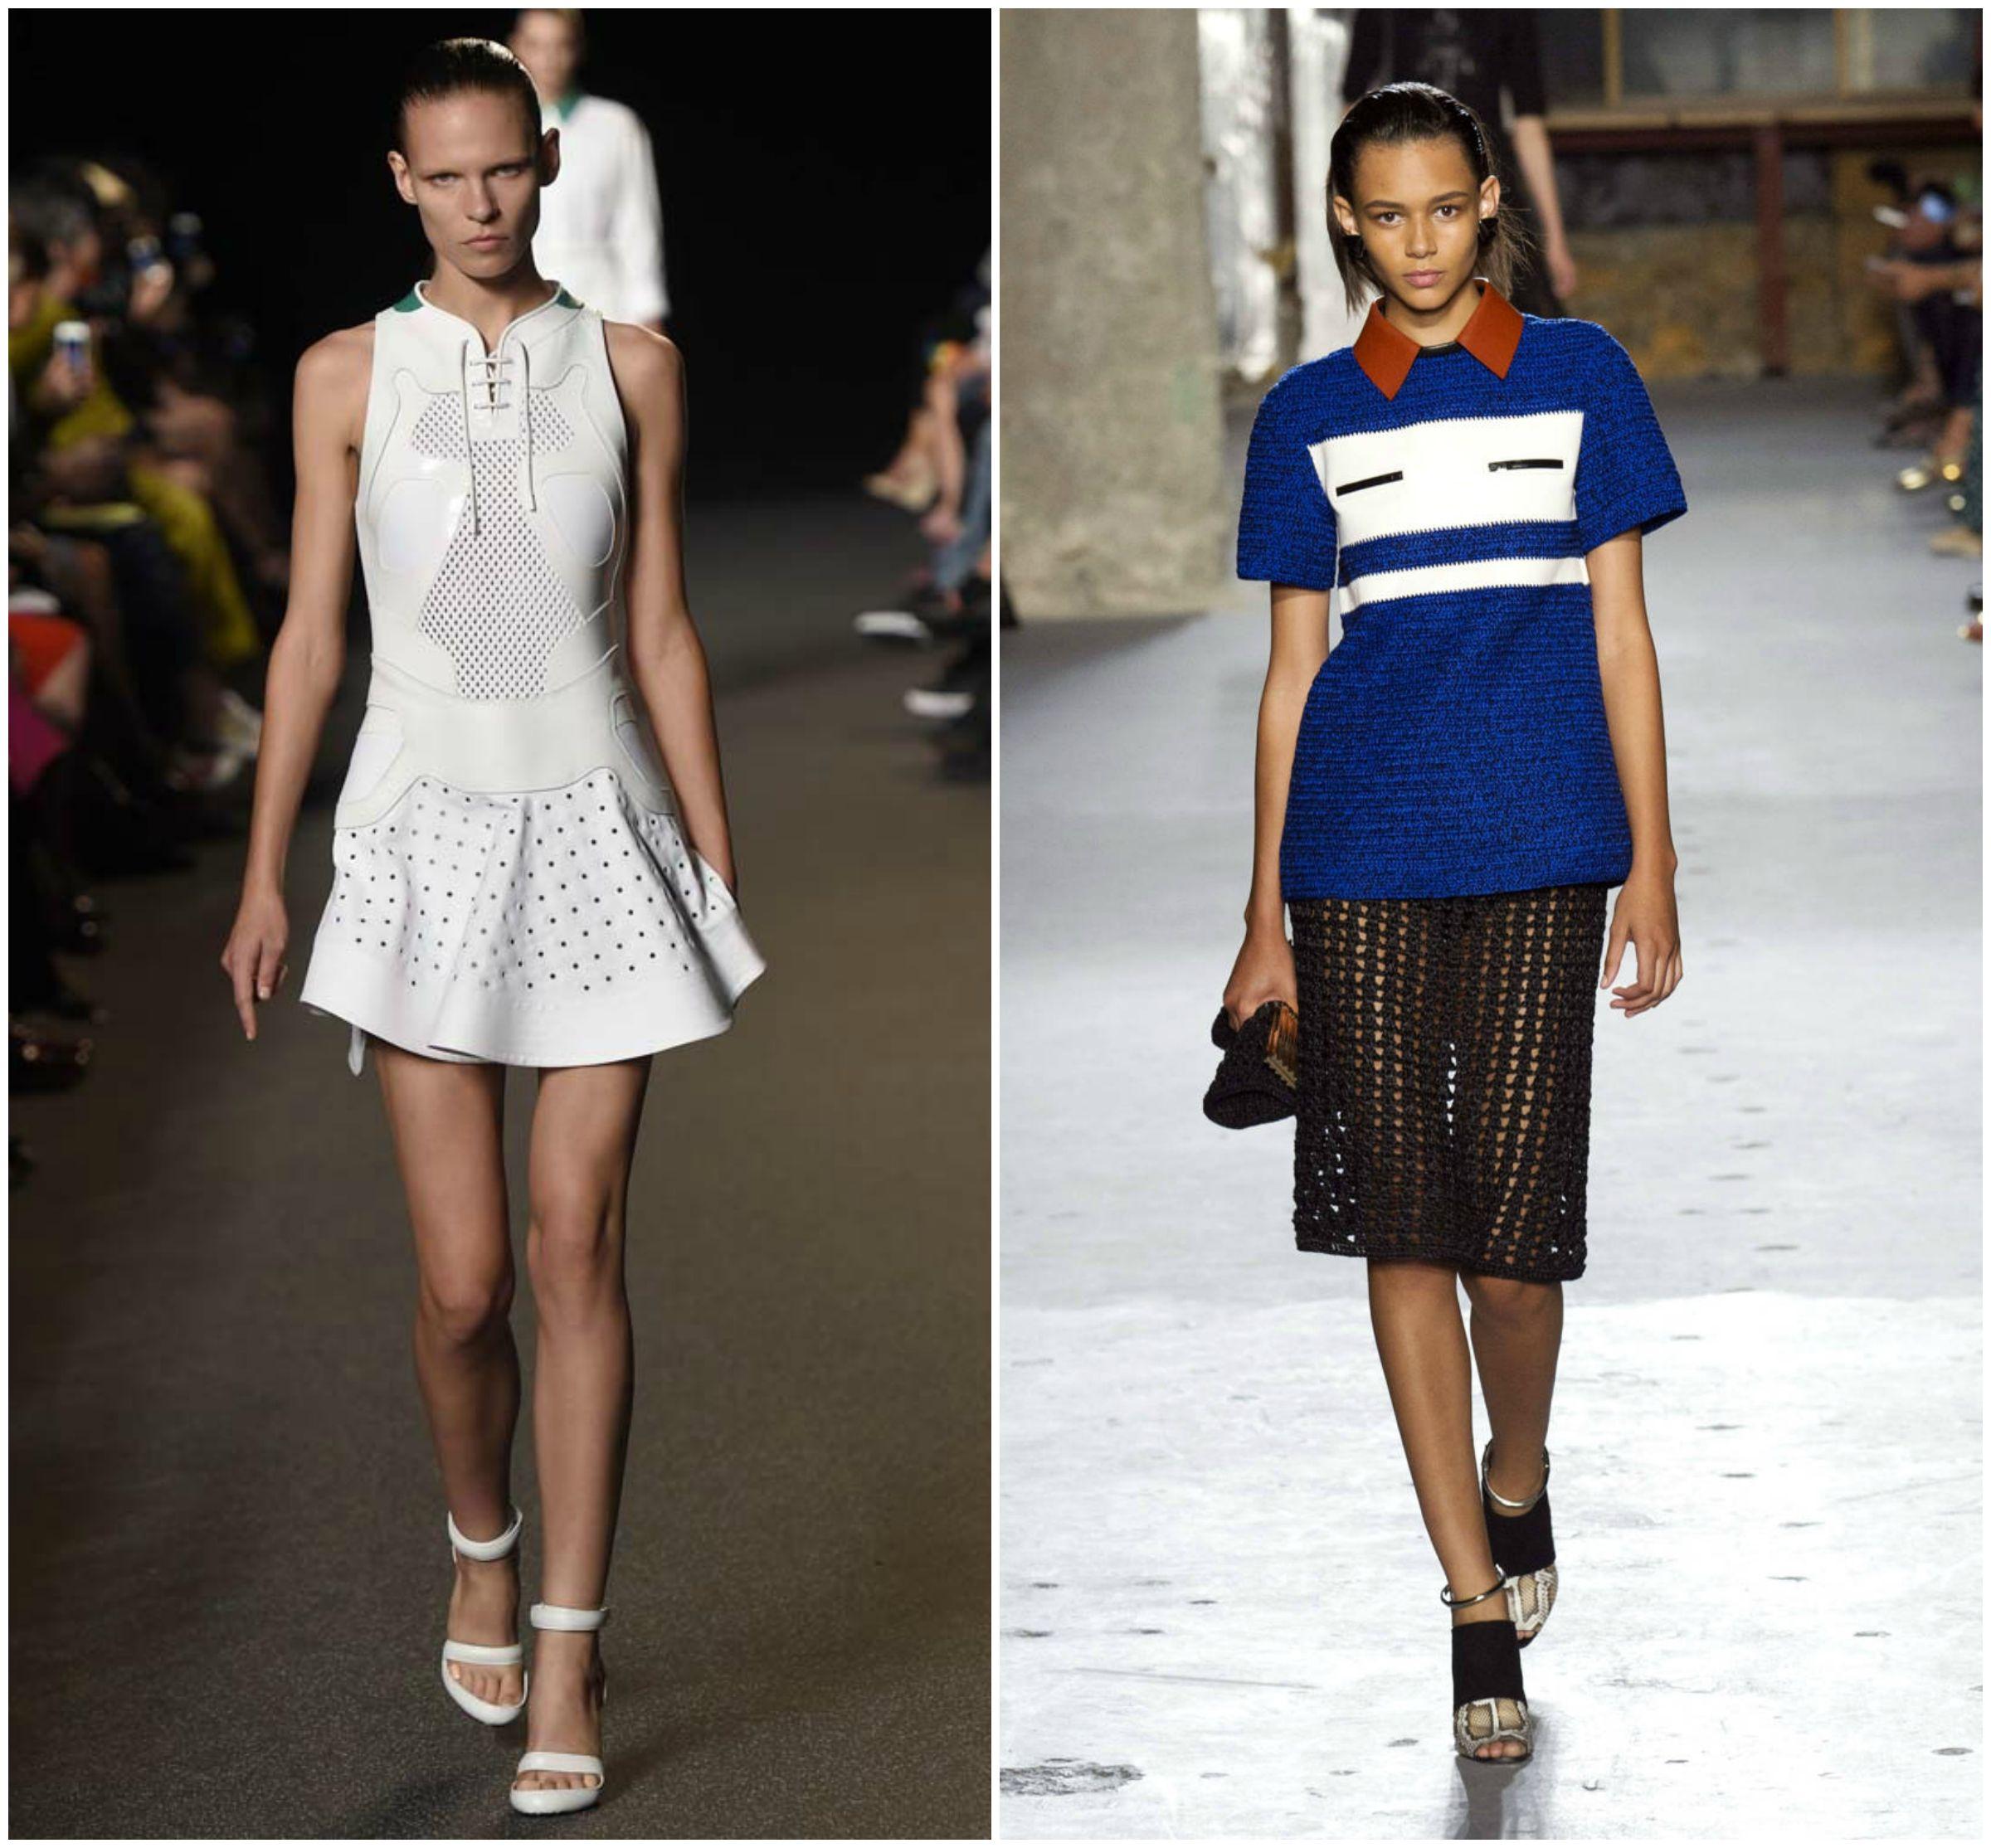 sportswear sports white blue black heels collar